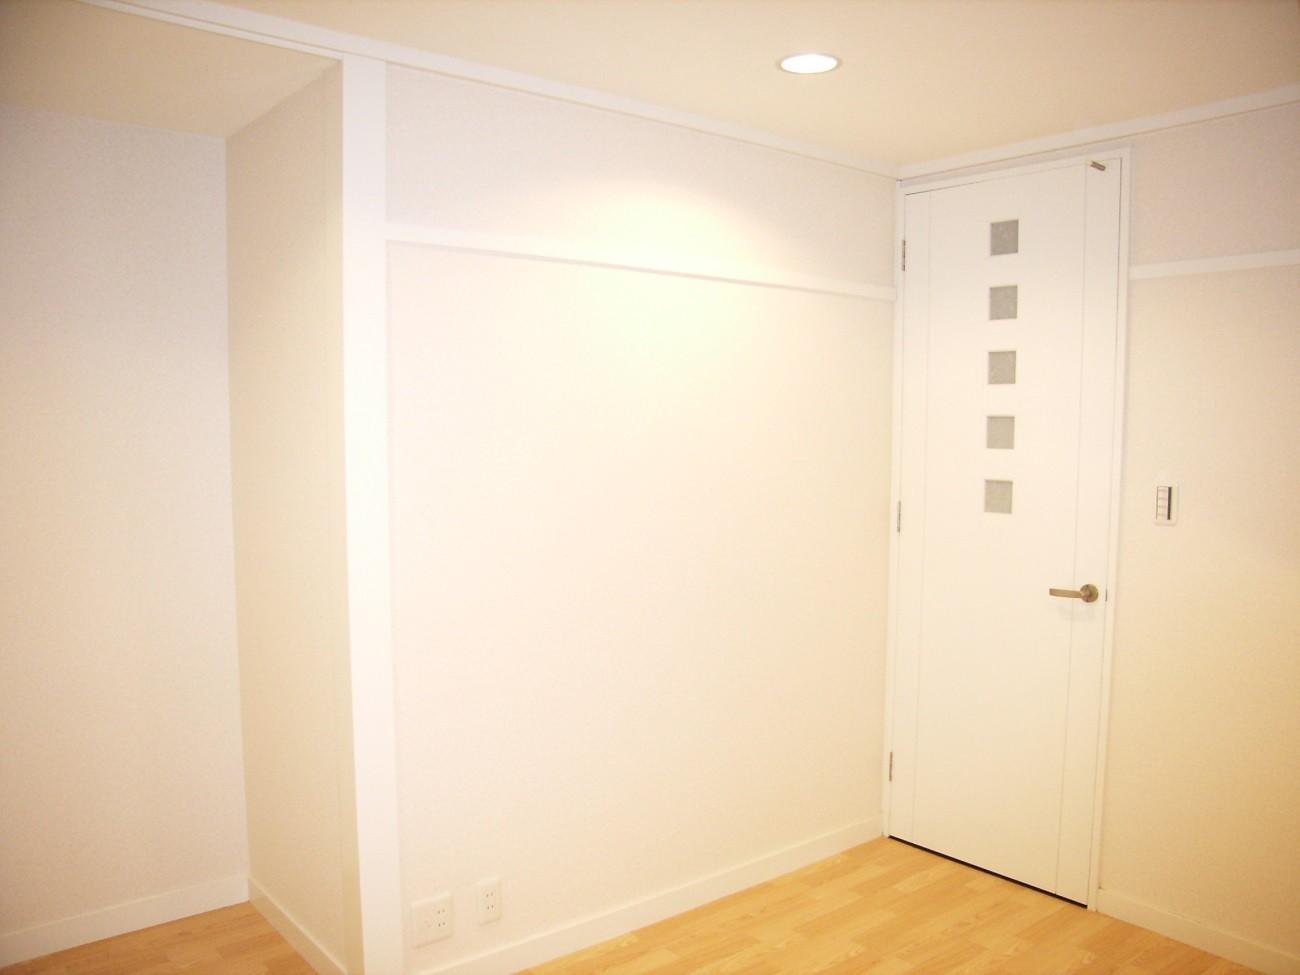 子供部屋事例:子供部屋(店舗(自然派日用品)付き住宅のリフォーム)